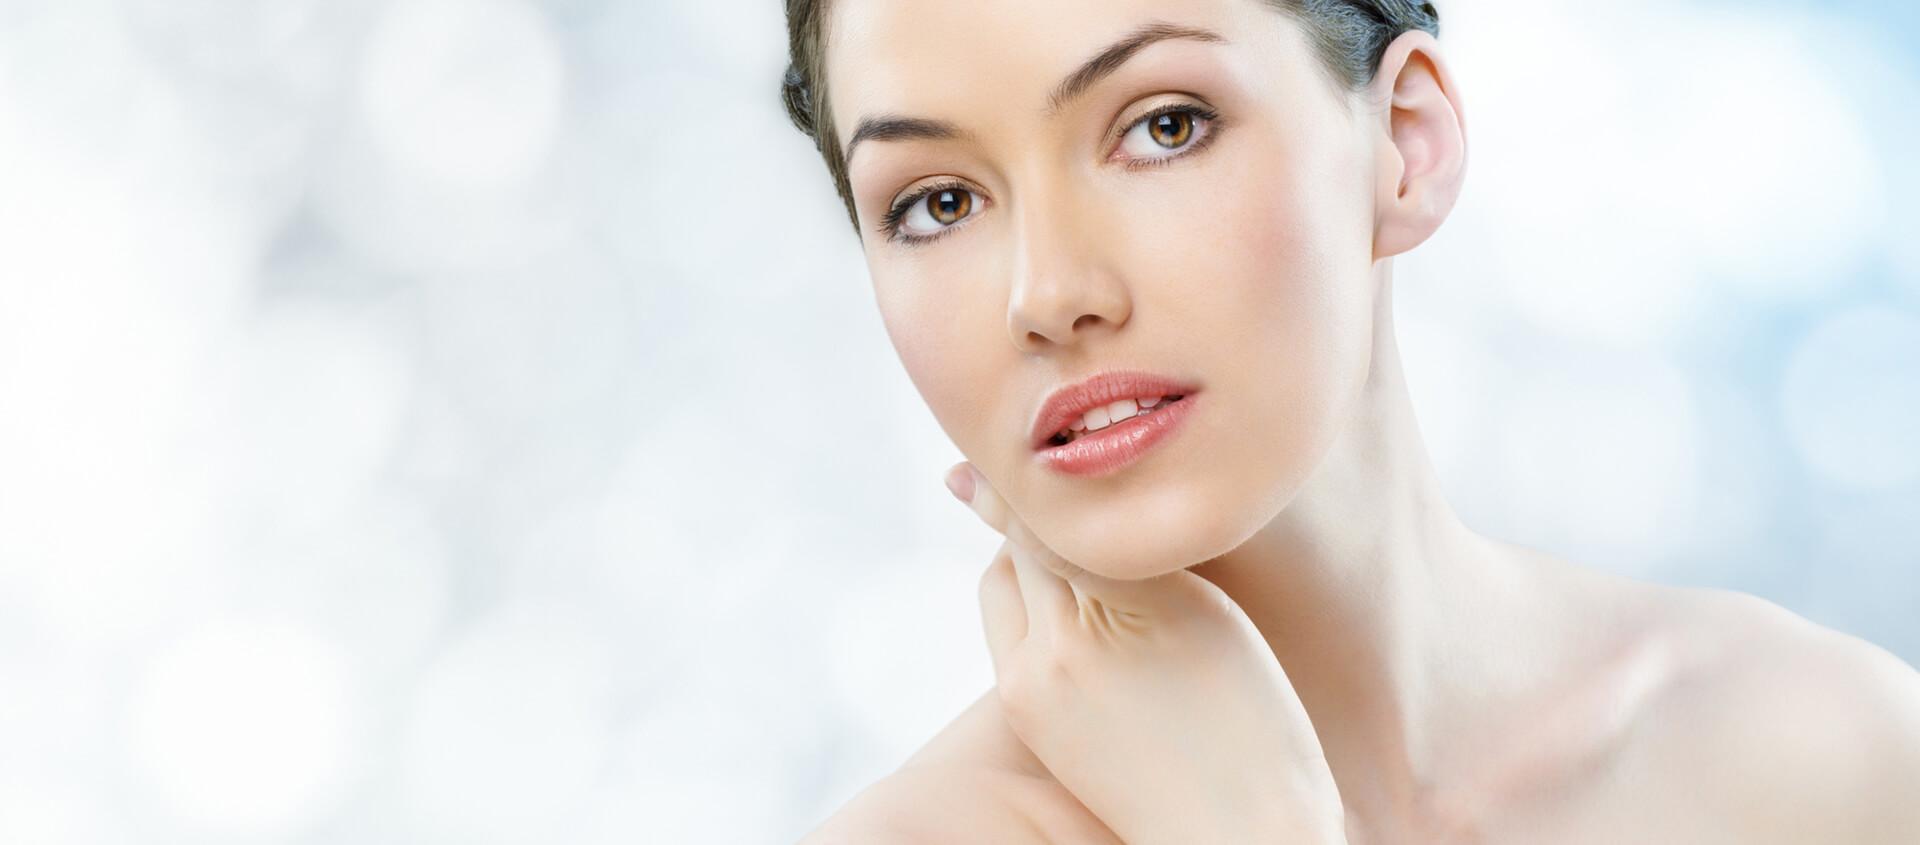 Mark H. Tseng, M.D. Blog | Discover the infinite skin rejuvenation possibilities of INFINI treatment in Kirkland, WA